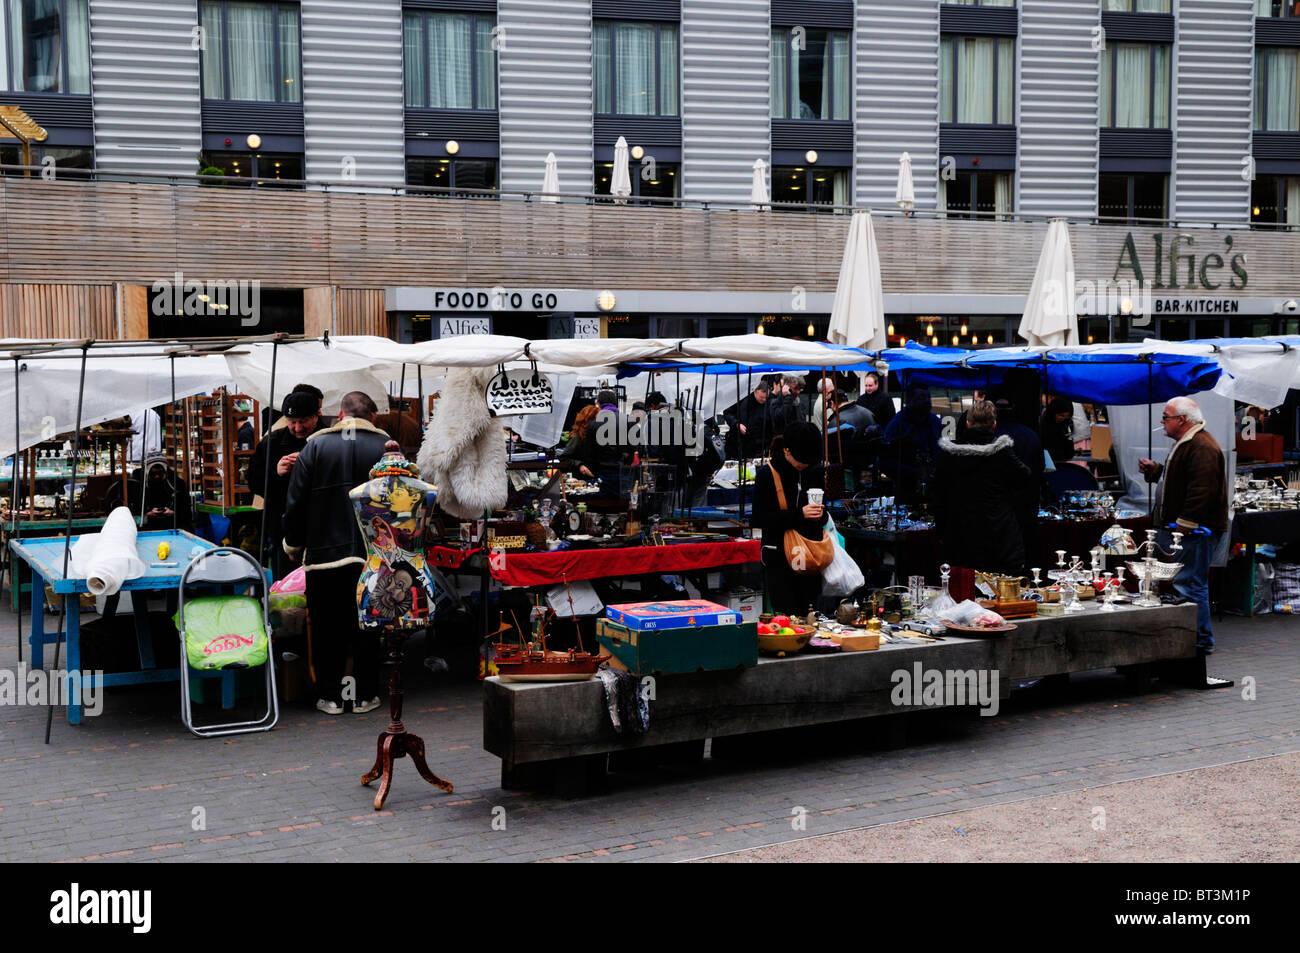 Bermondsey Square Antiques Market, Bermondsey, London, England, UK - Stock Image